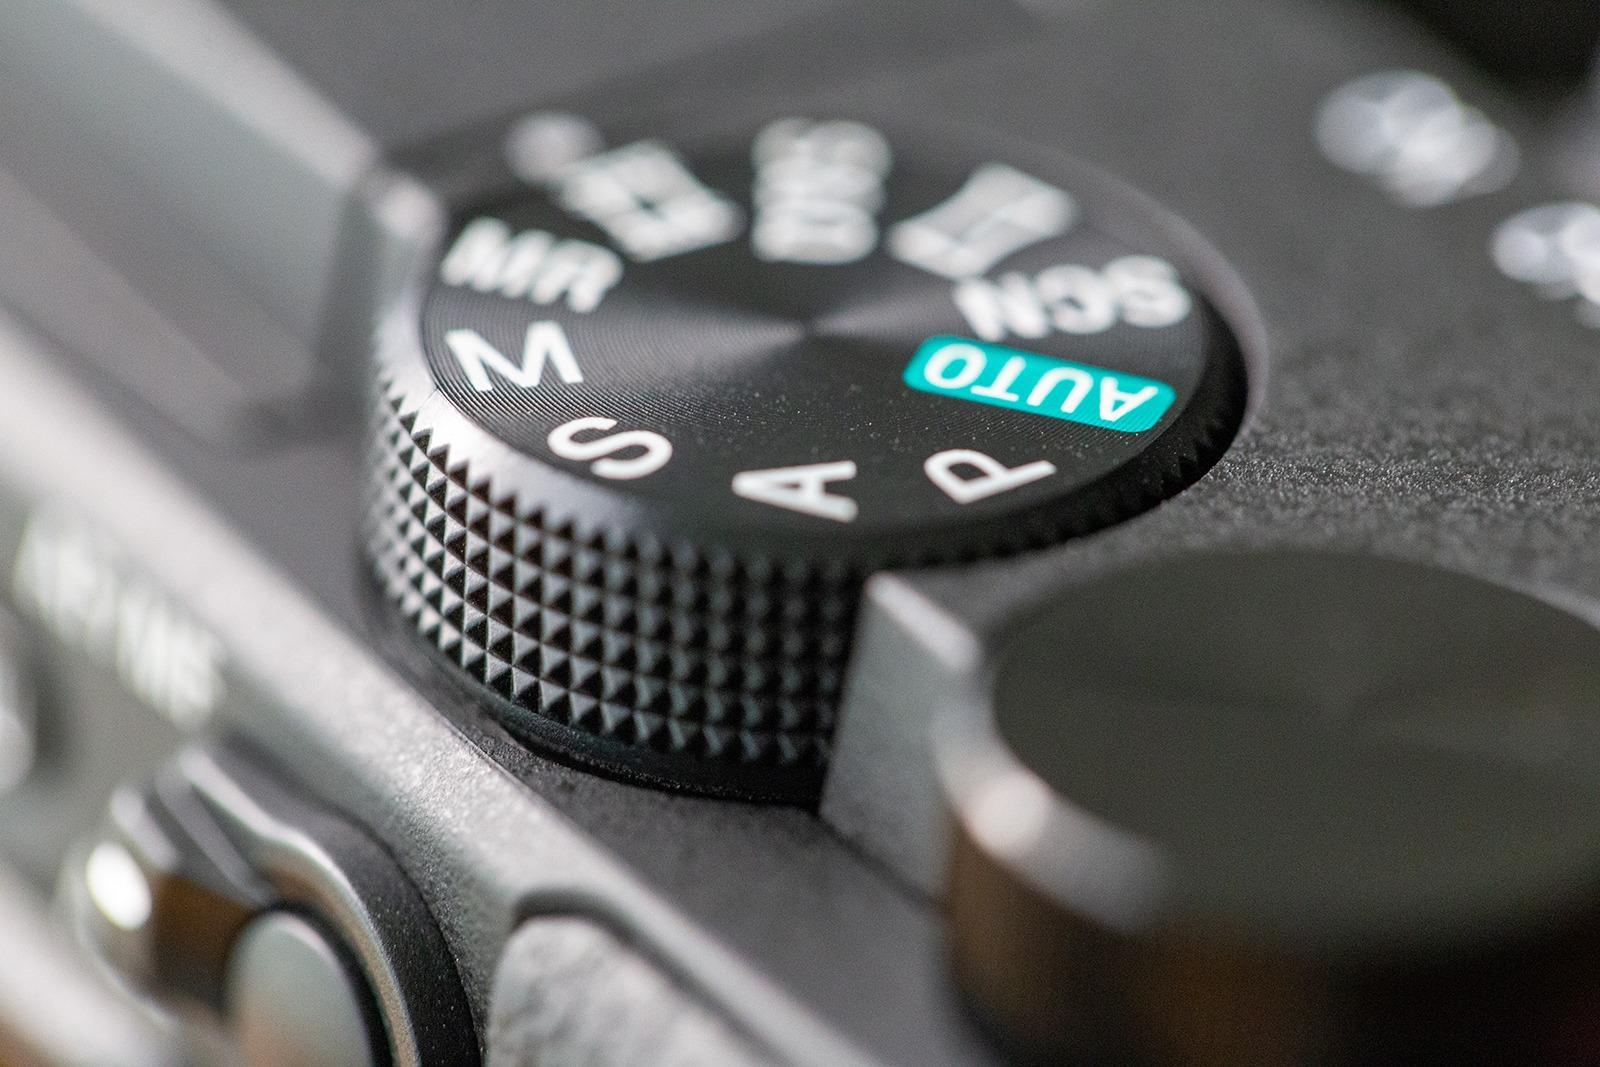 Dials on a camera